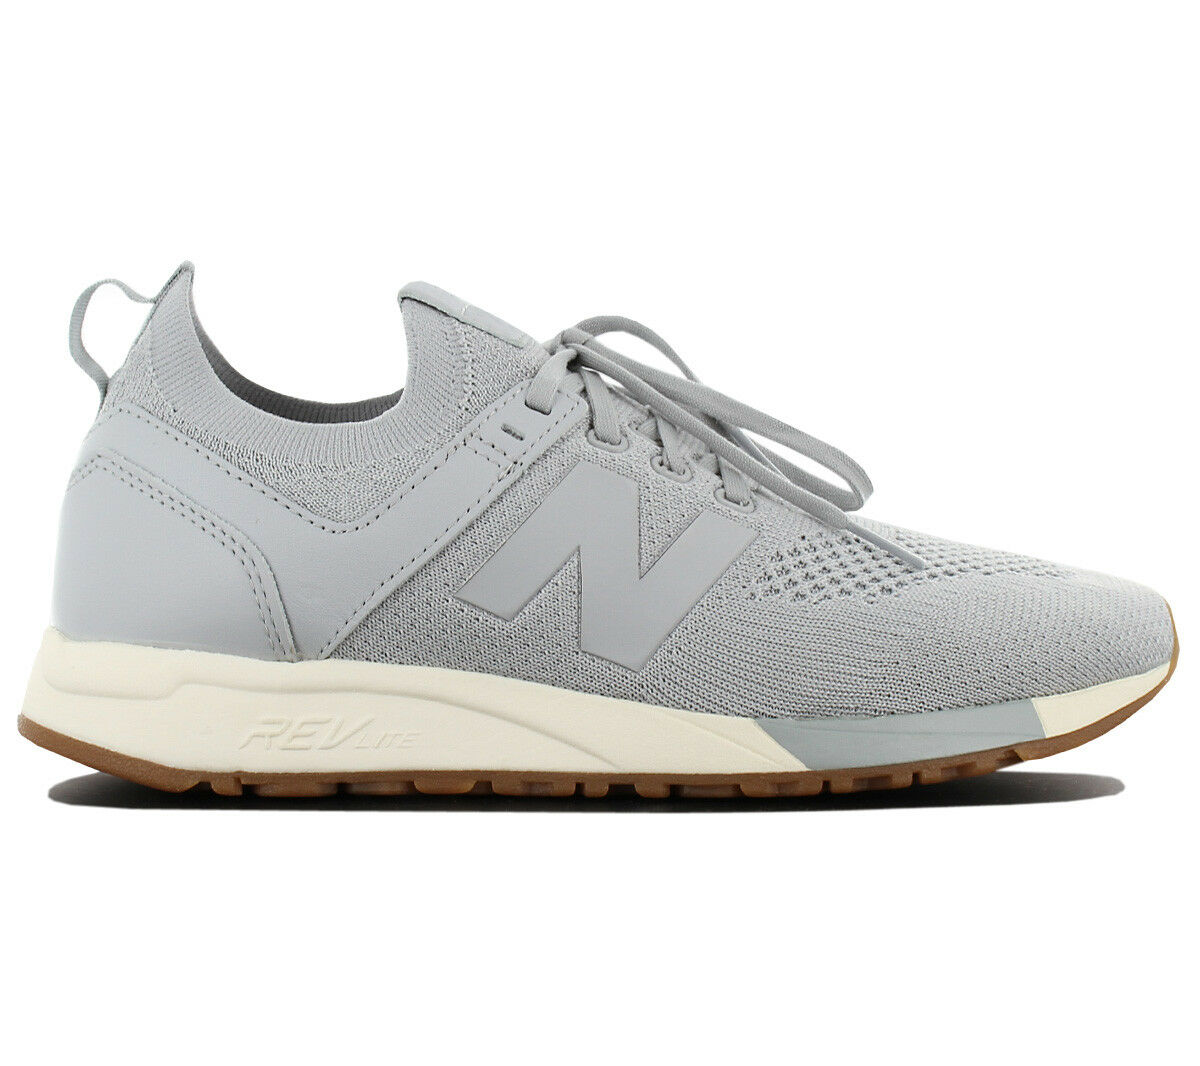 New Balance Lifestyle 247 MRL247DS Herren Turnschuhe Grau Schuhe REVlite Turnschuhe